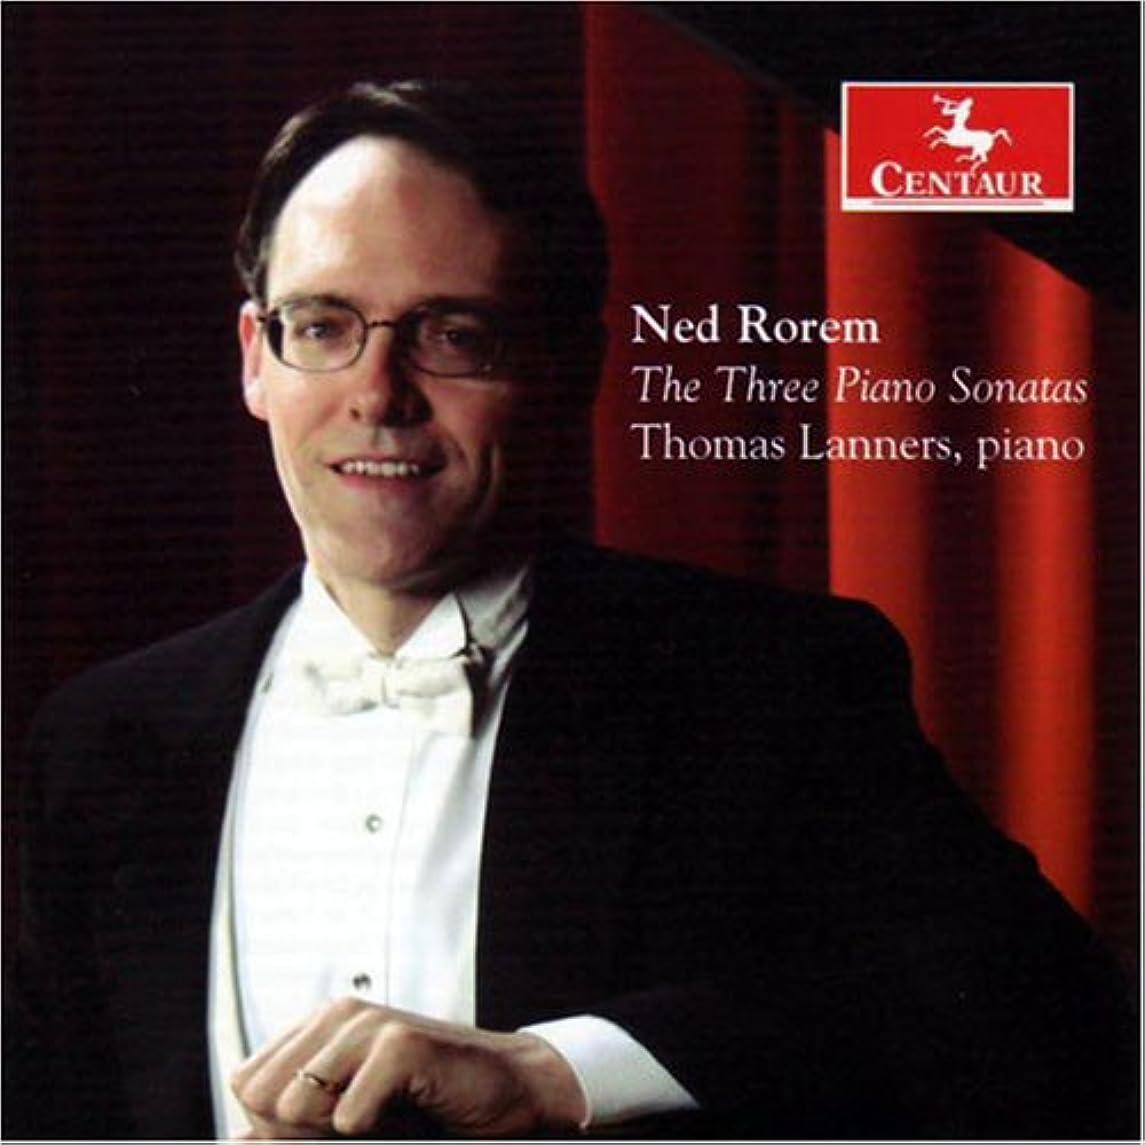 Ned Rorem: The Three Piano Sonatas